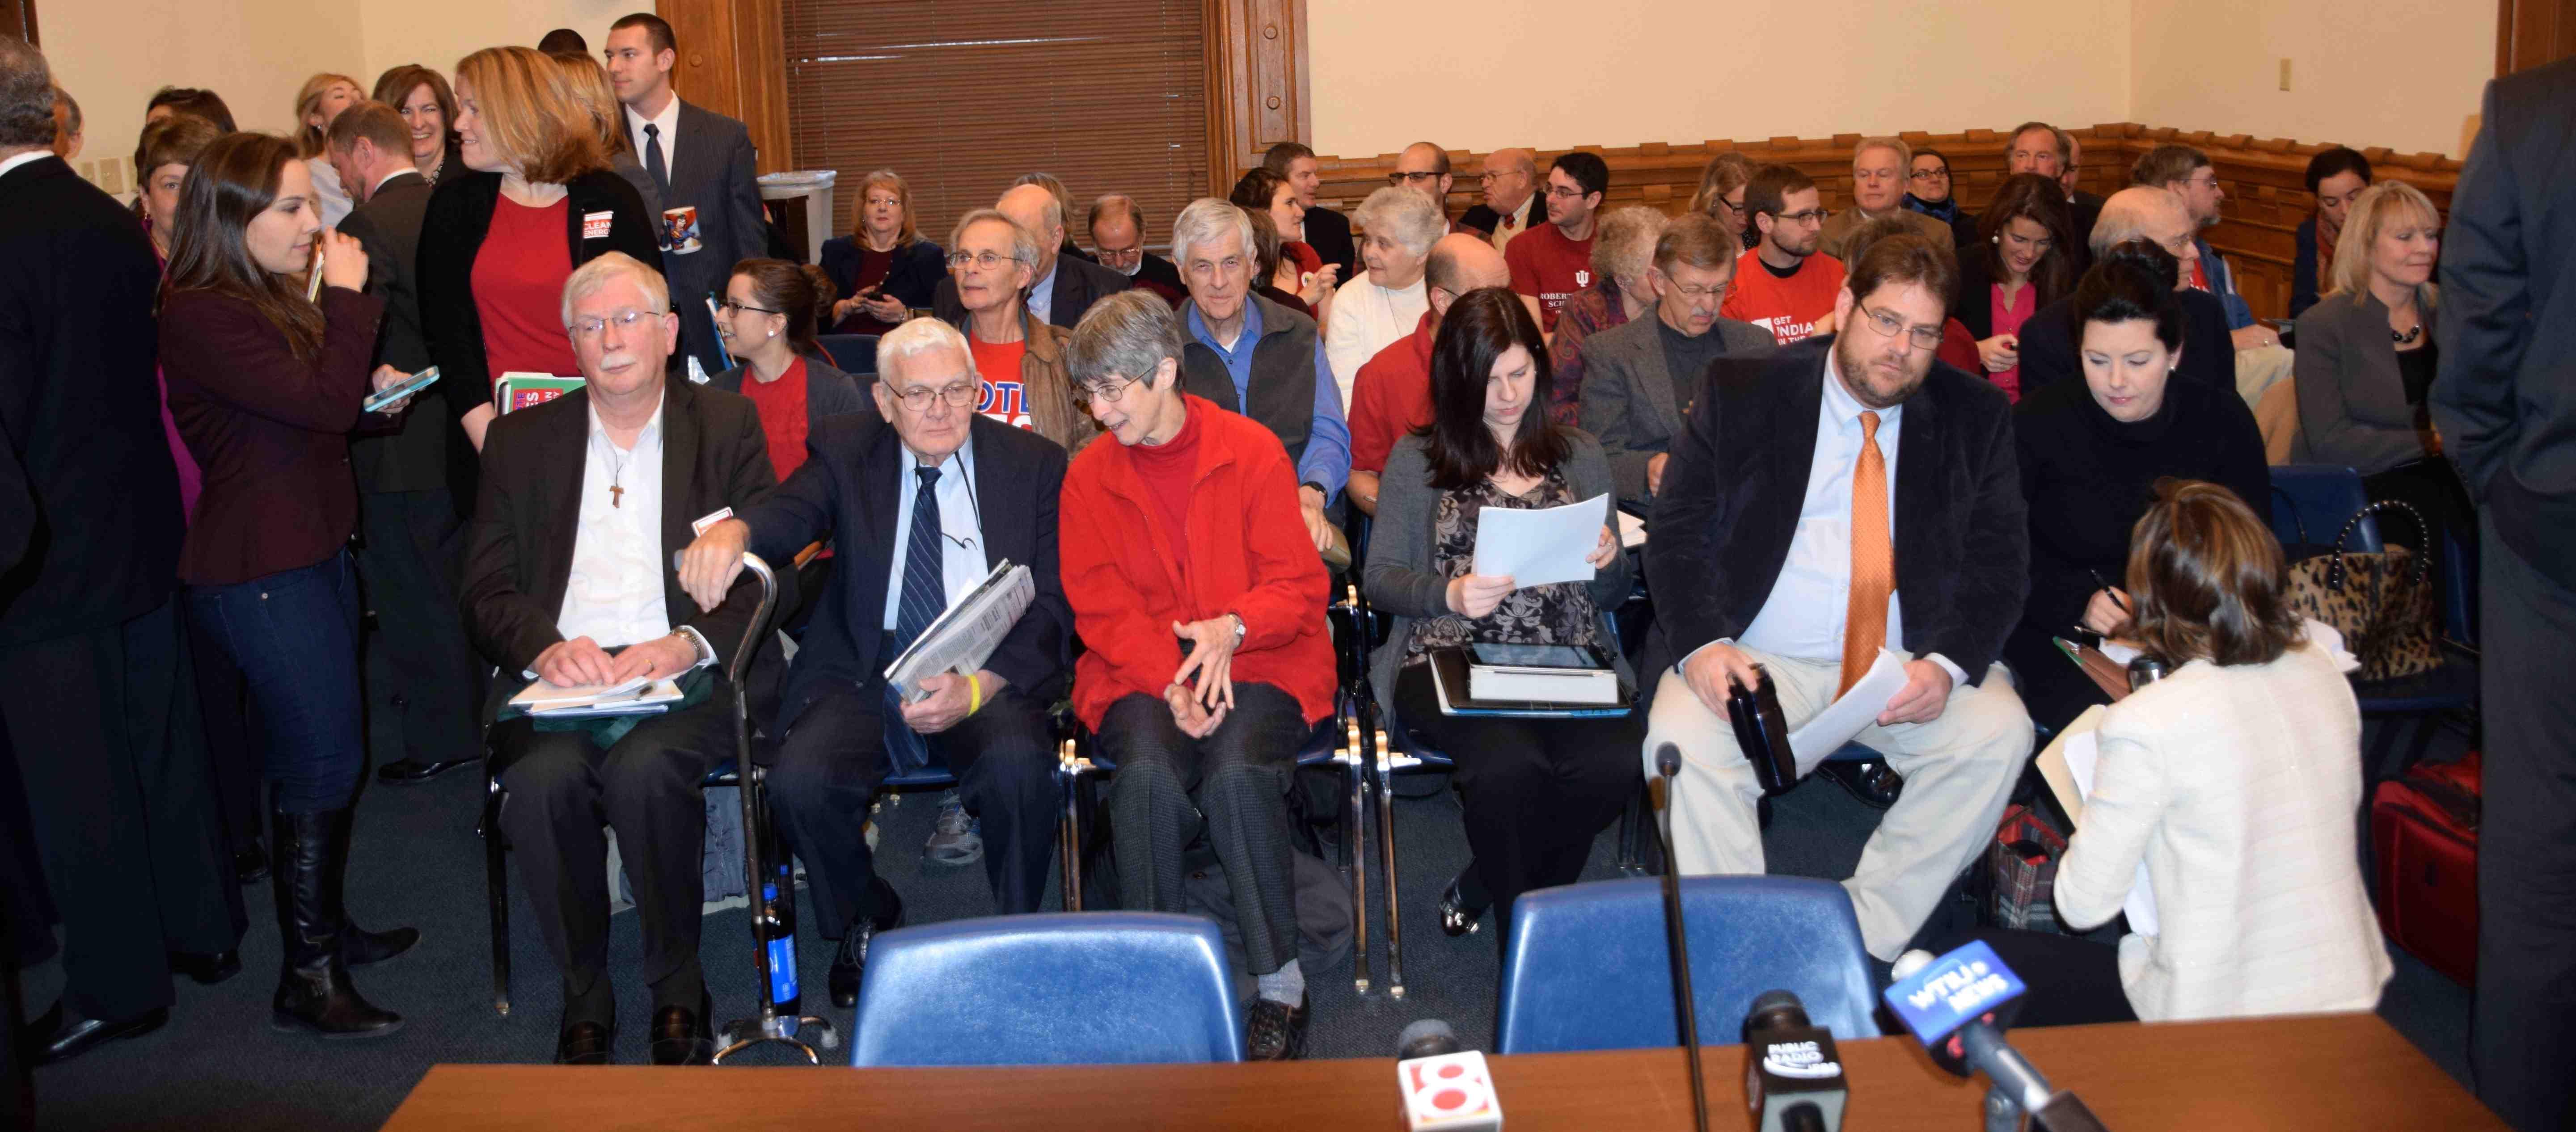 SB_412_committee_hearing.jpg